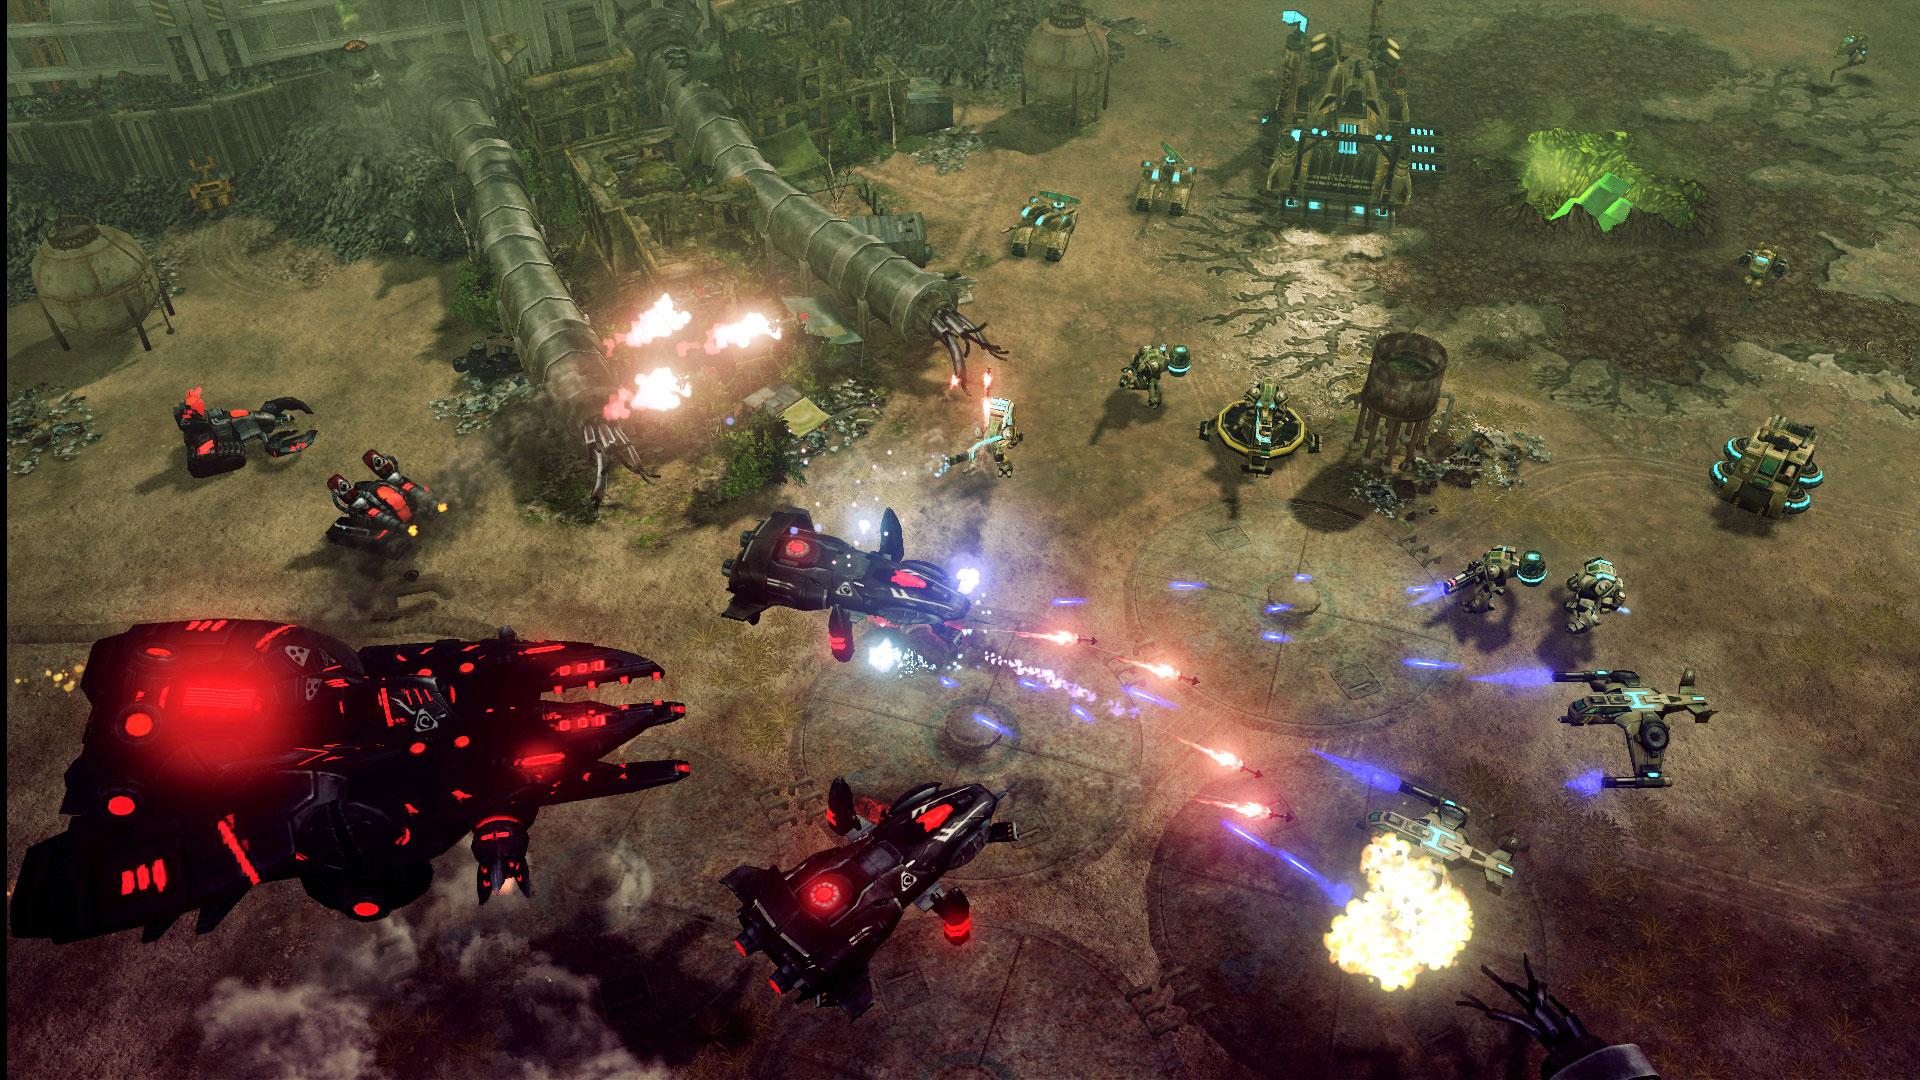 Command & Conquer 4: Tiberian Twilight screenshot